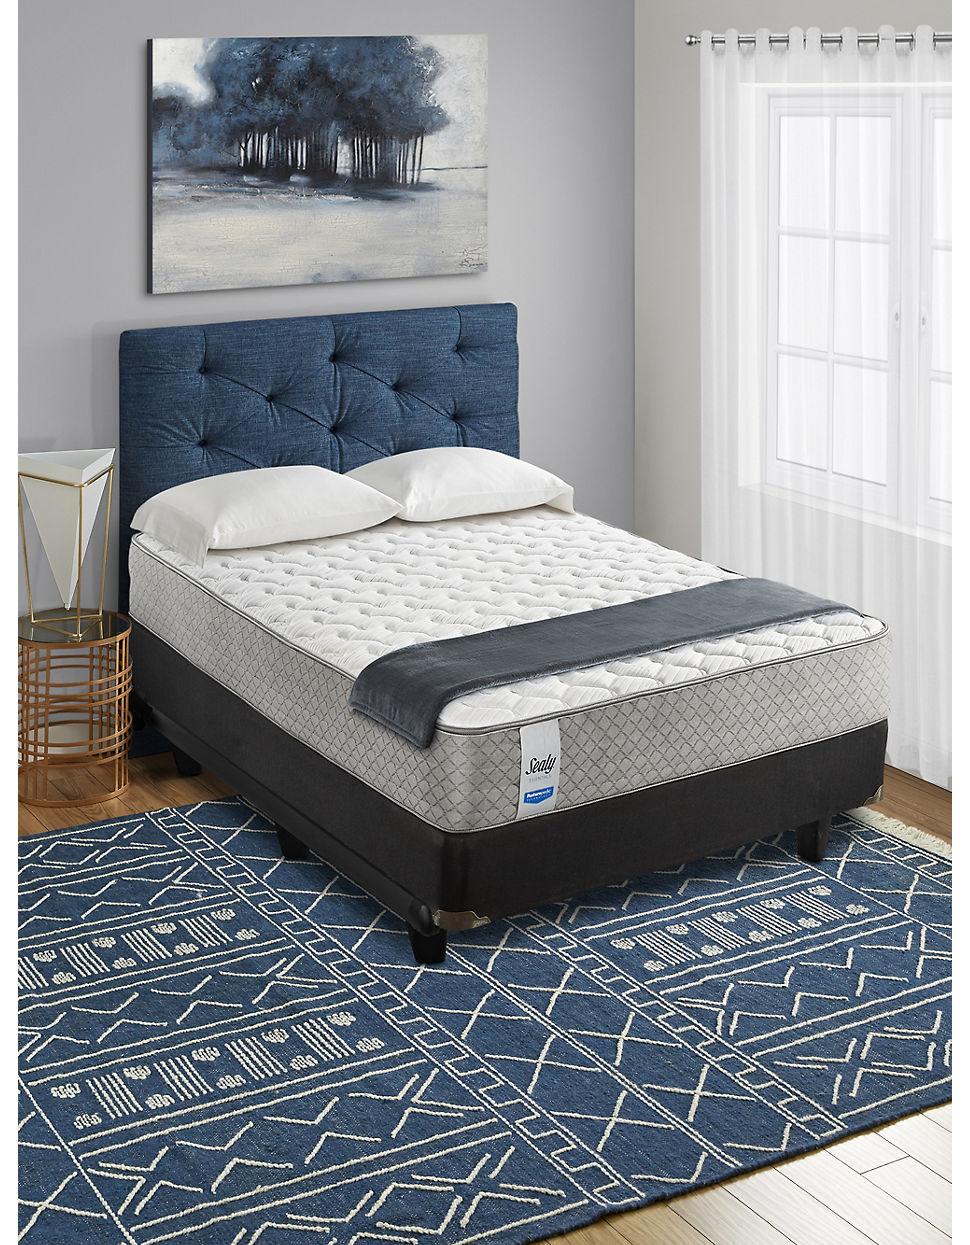 Bed frame king size embrace bed frame king size embrace bed frame king - Posturepedic Classic Aviana Firm Tight Top Set